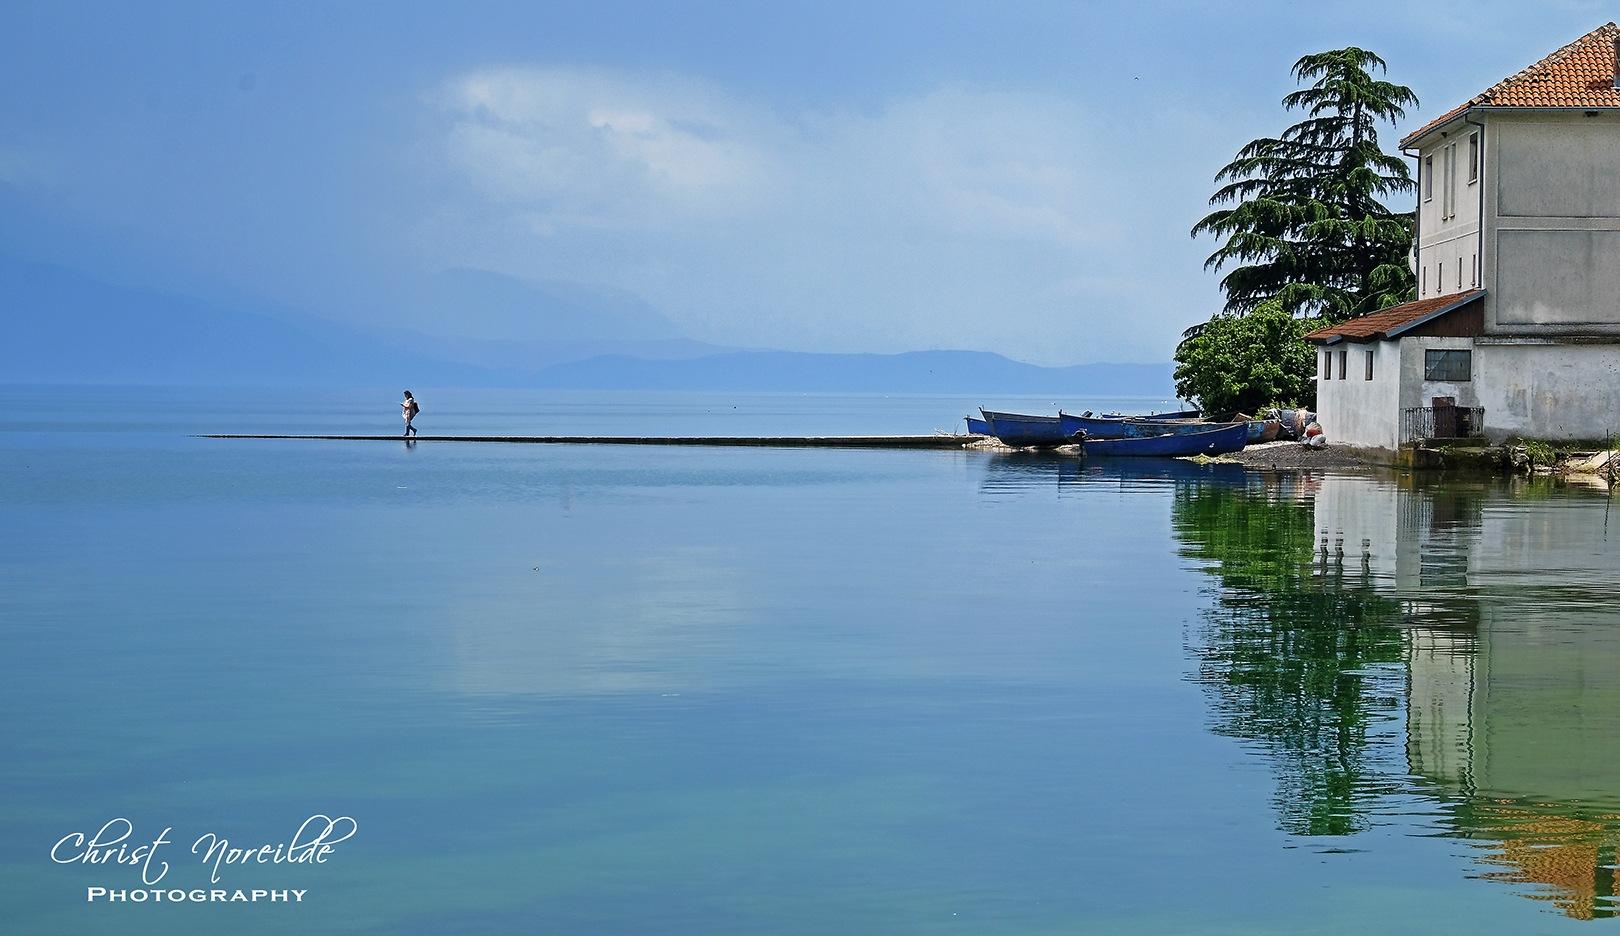 Walk on water by Christ Noreilde